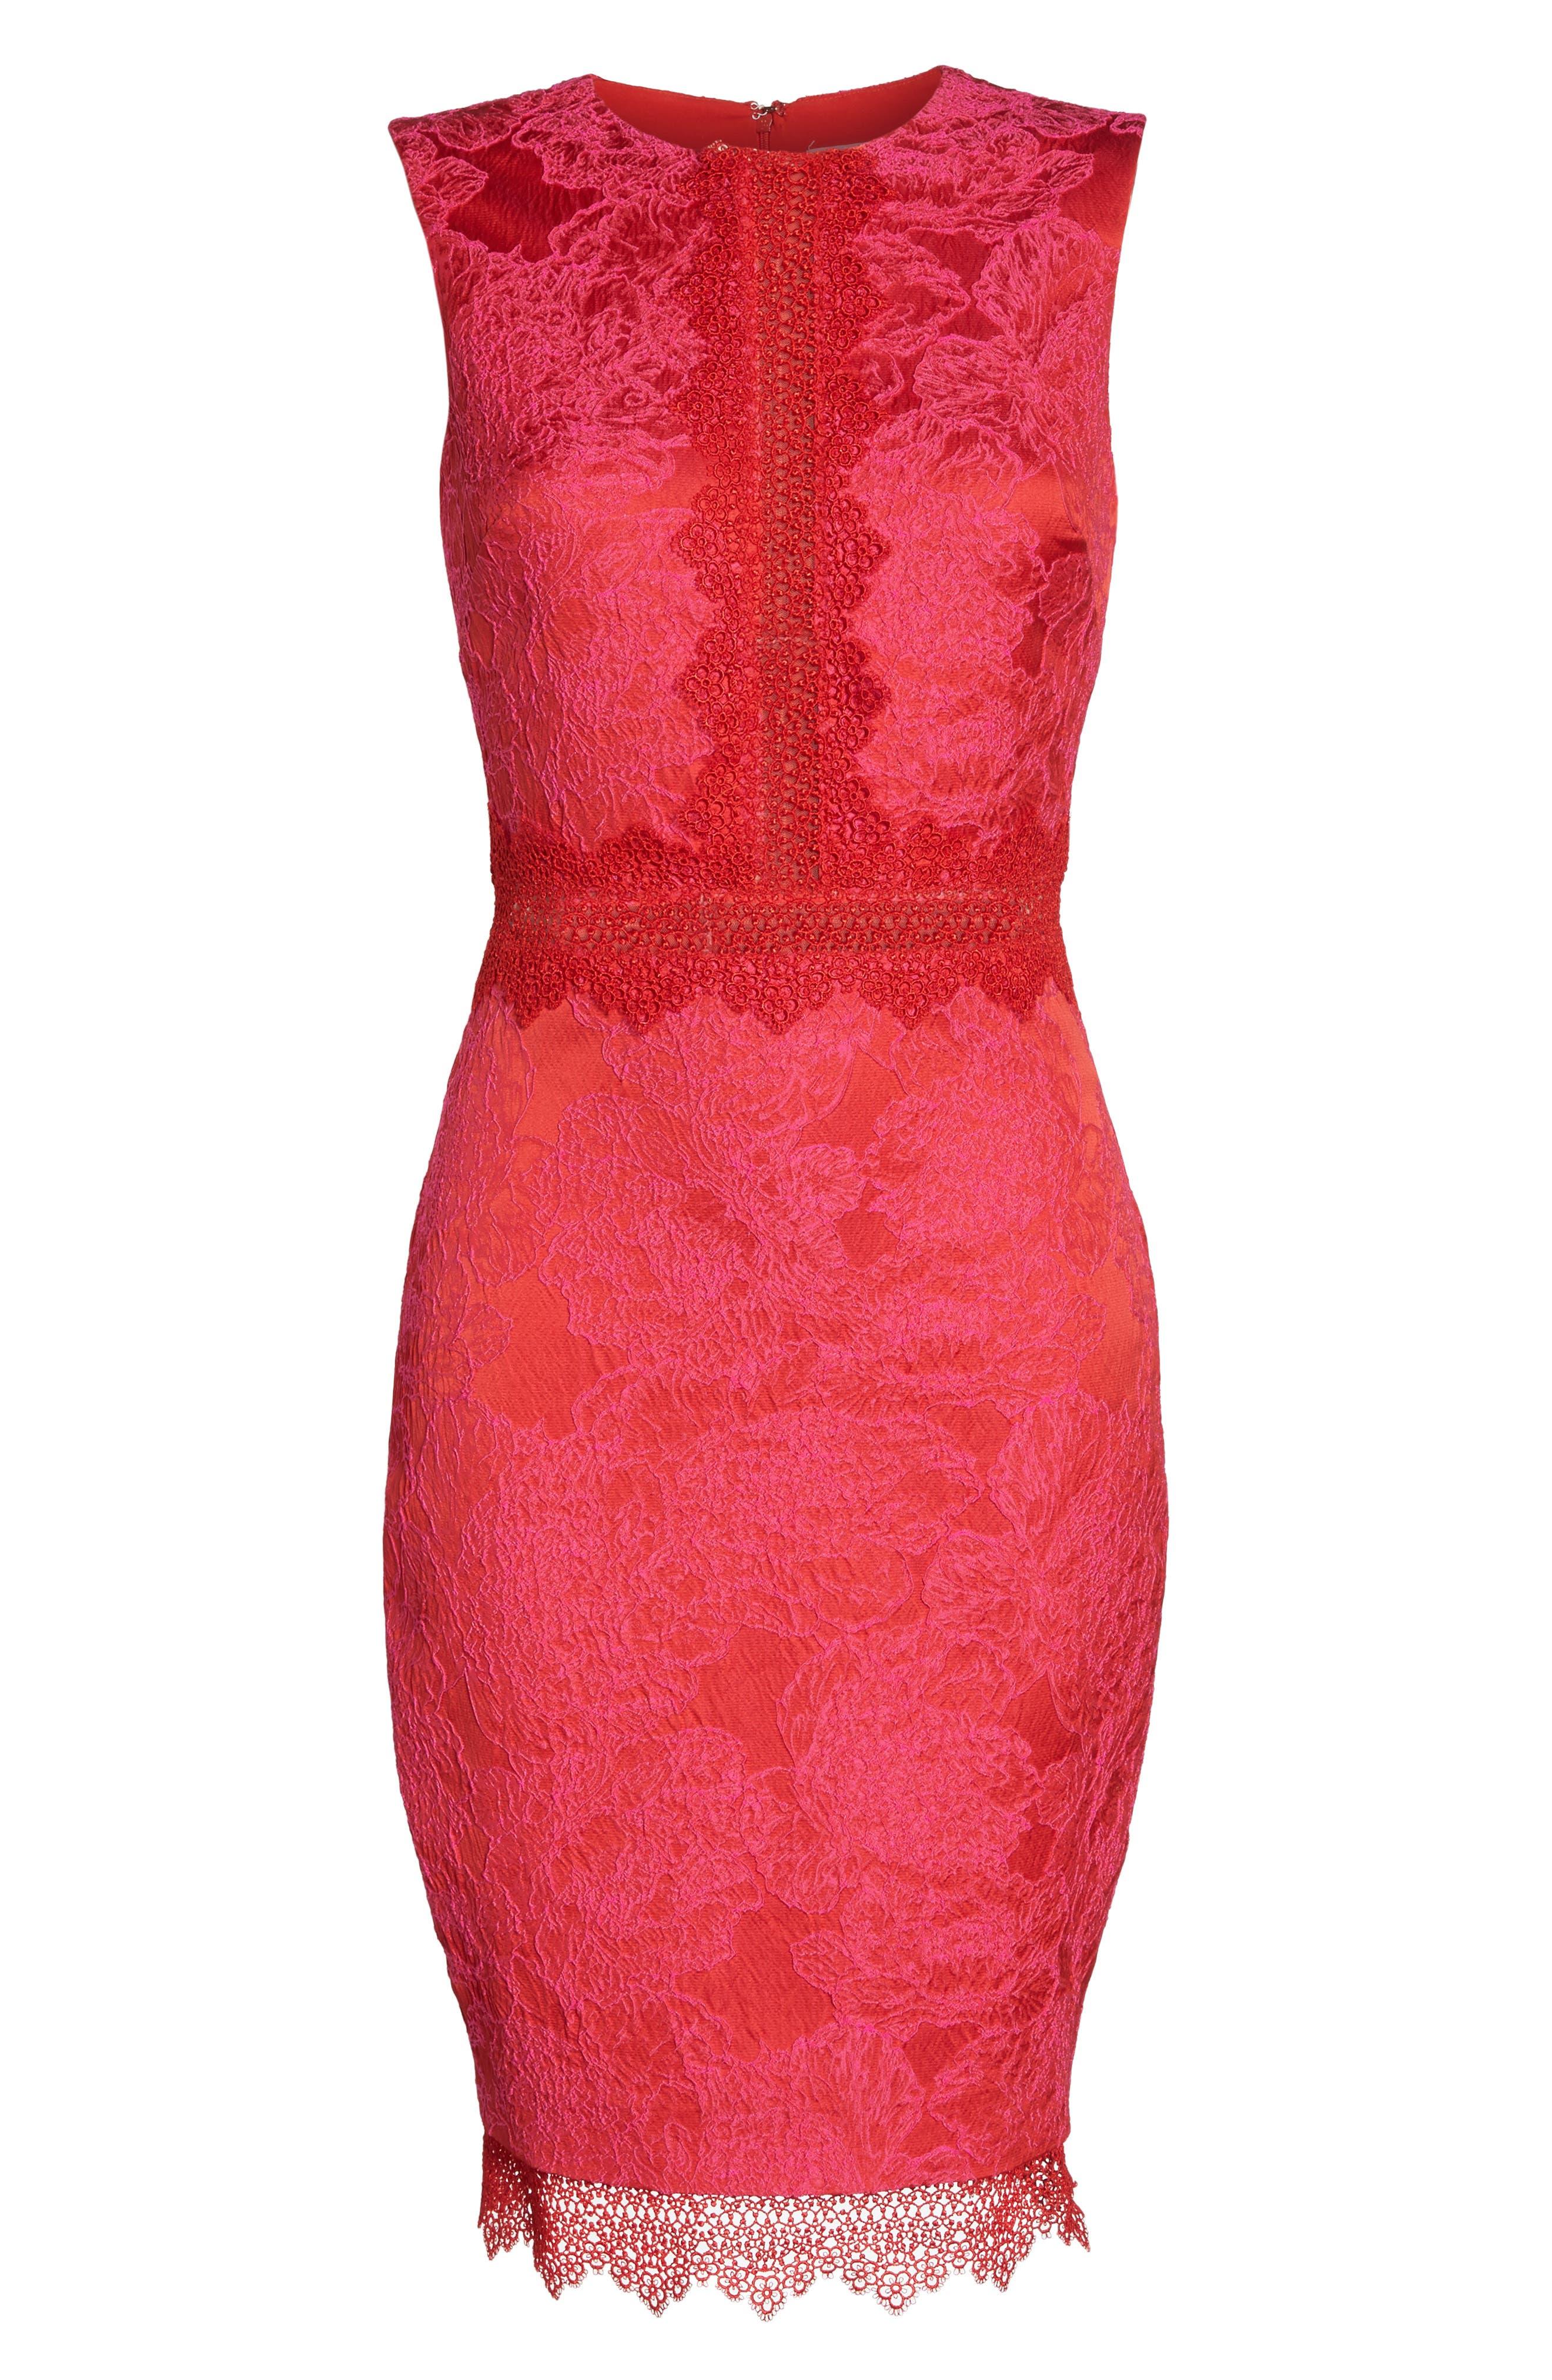 Lace Panel Sheath Dress,                             Alternate thumbnail 6, color,                             640